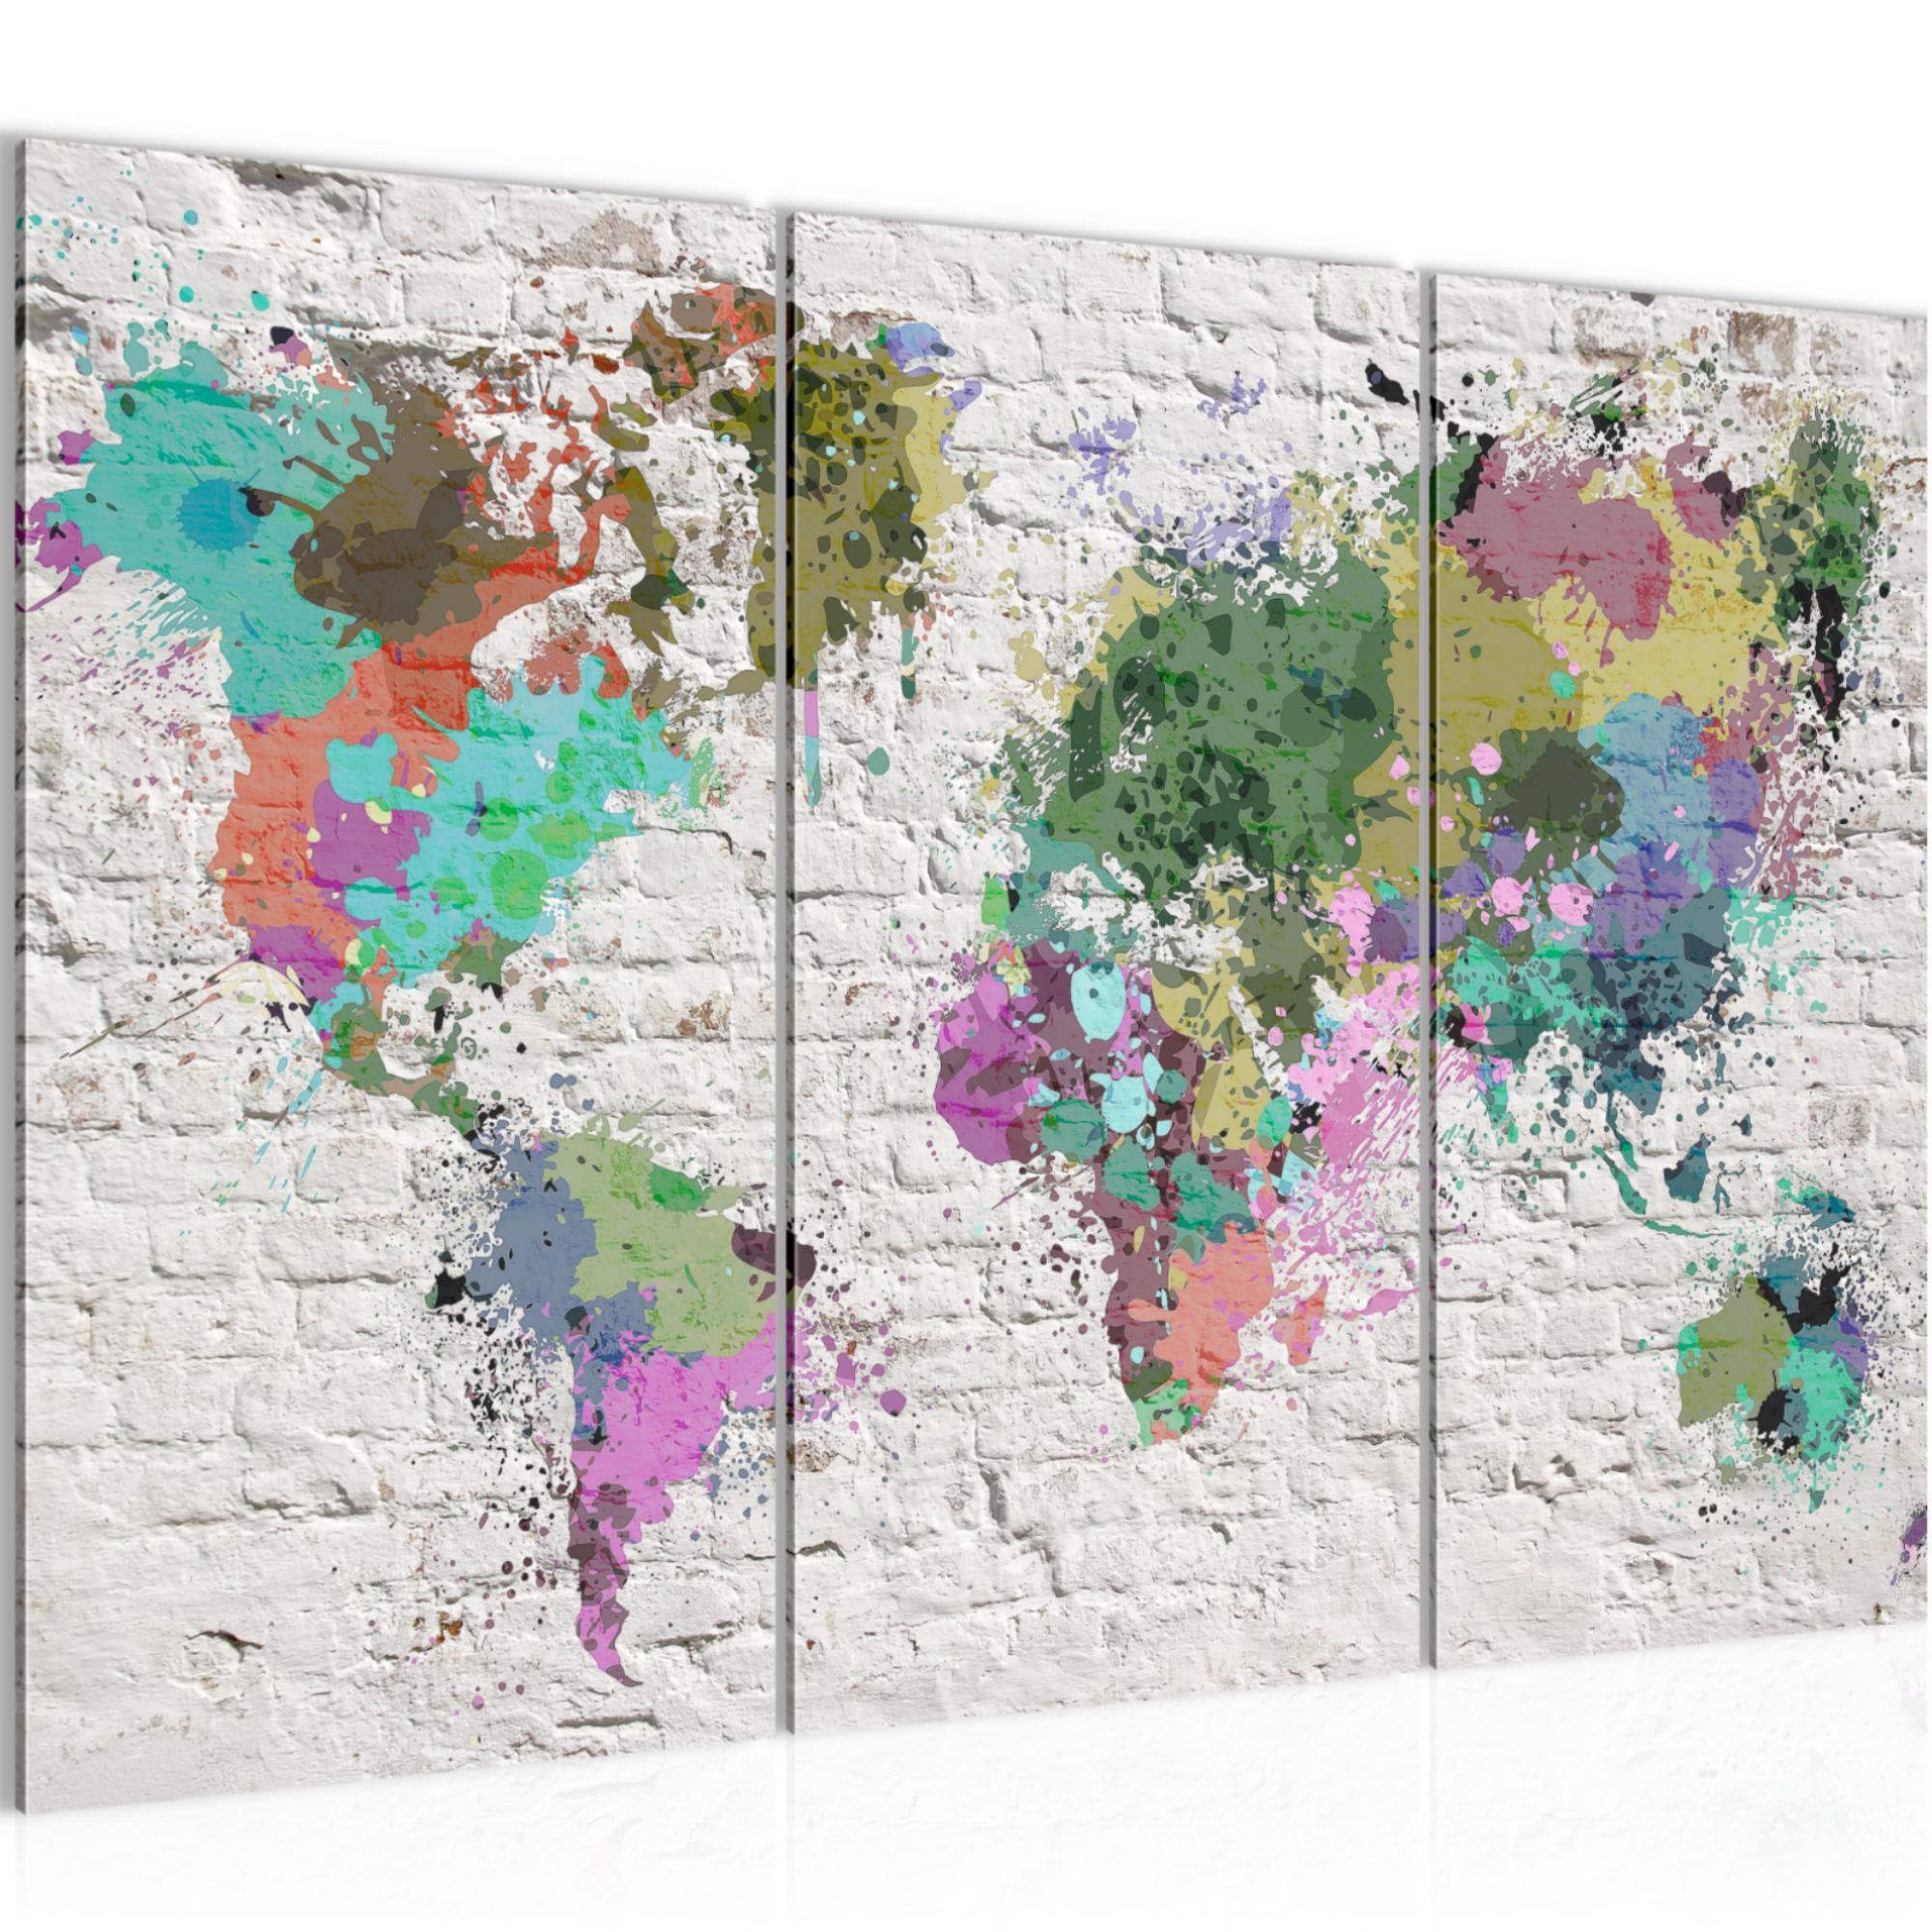 Weltkarte steinwand bild kunstdruck auf vlies leinwand xxl dekoration 3 teilig 107531p - Weltkarte bild leinwand ...